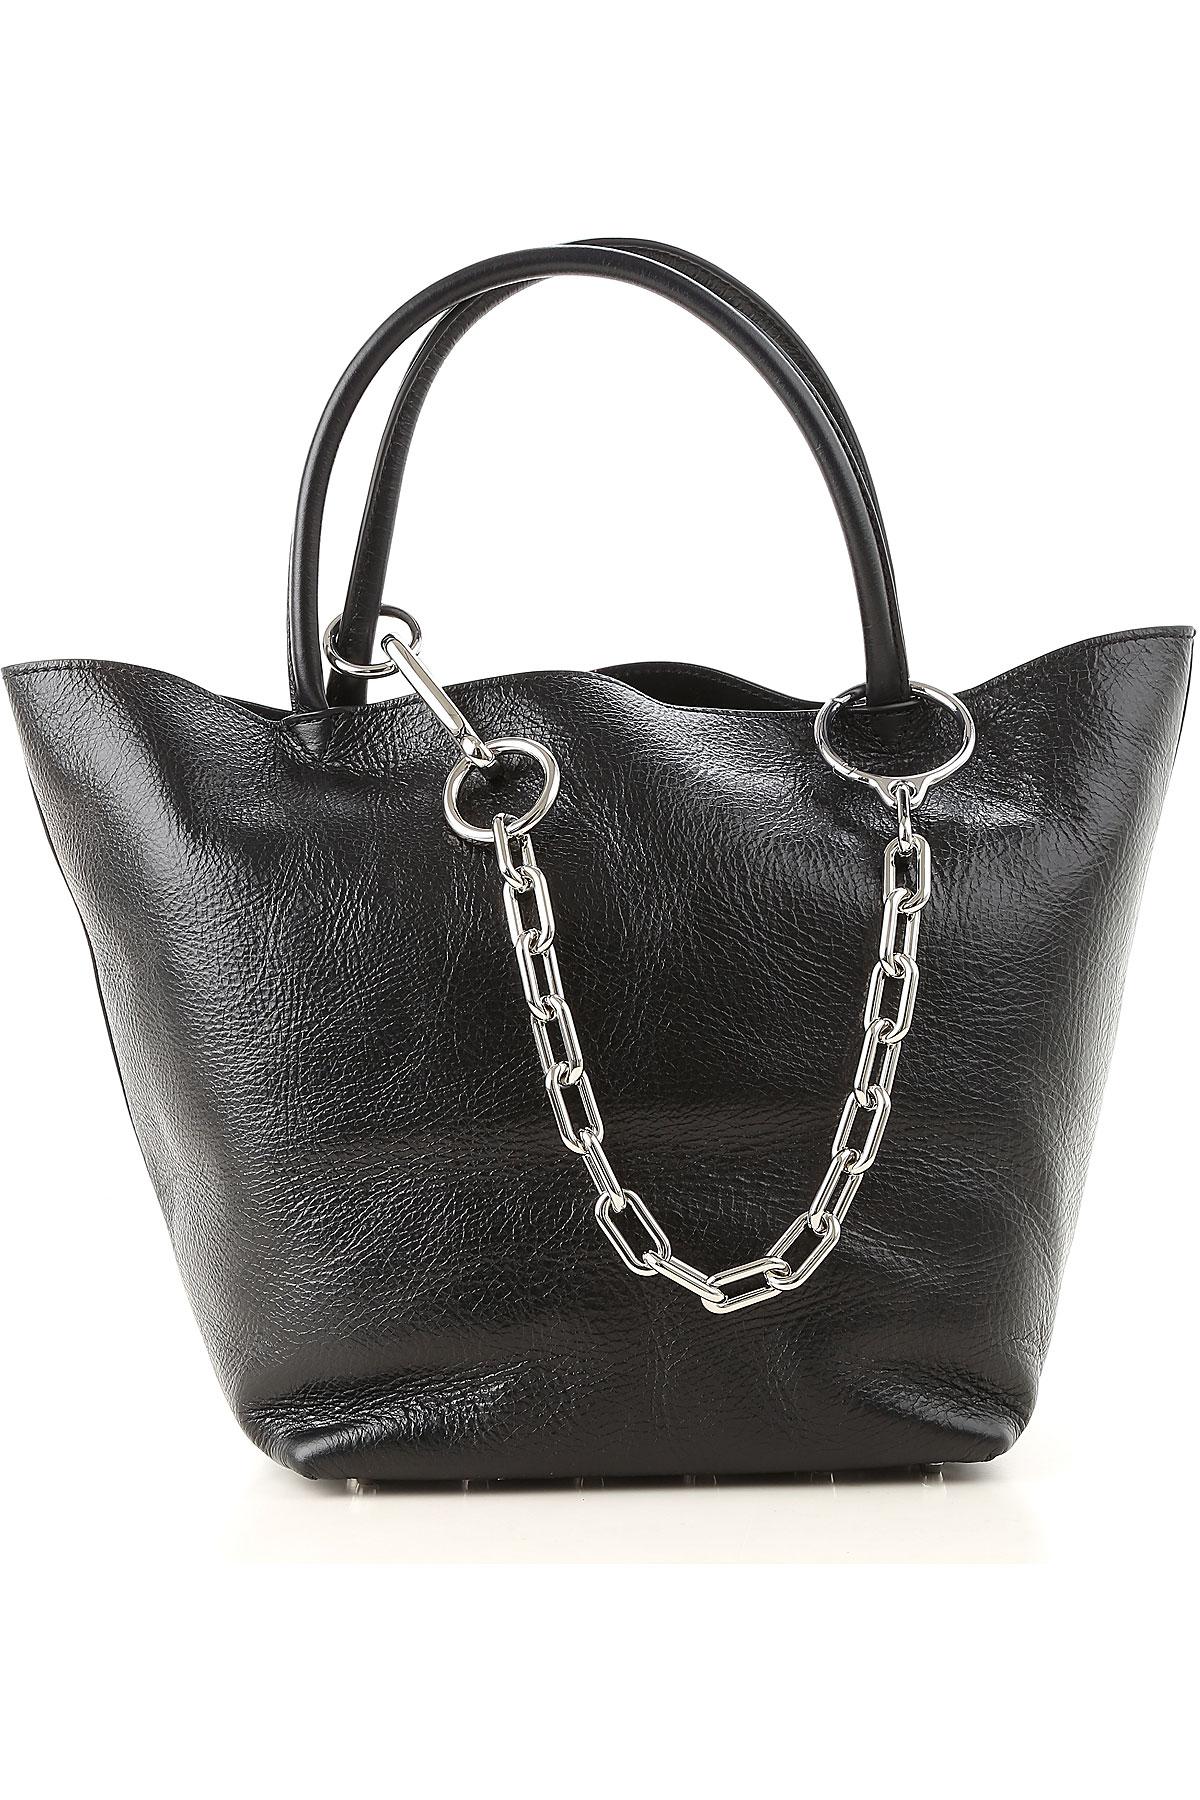 Image of Alexander Wang Tote Bag, Black, Leather, 2017